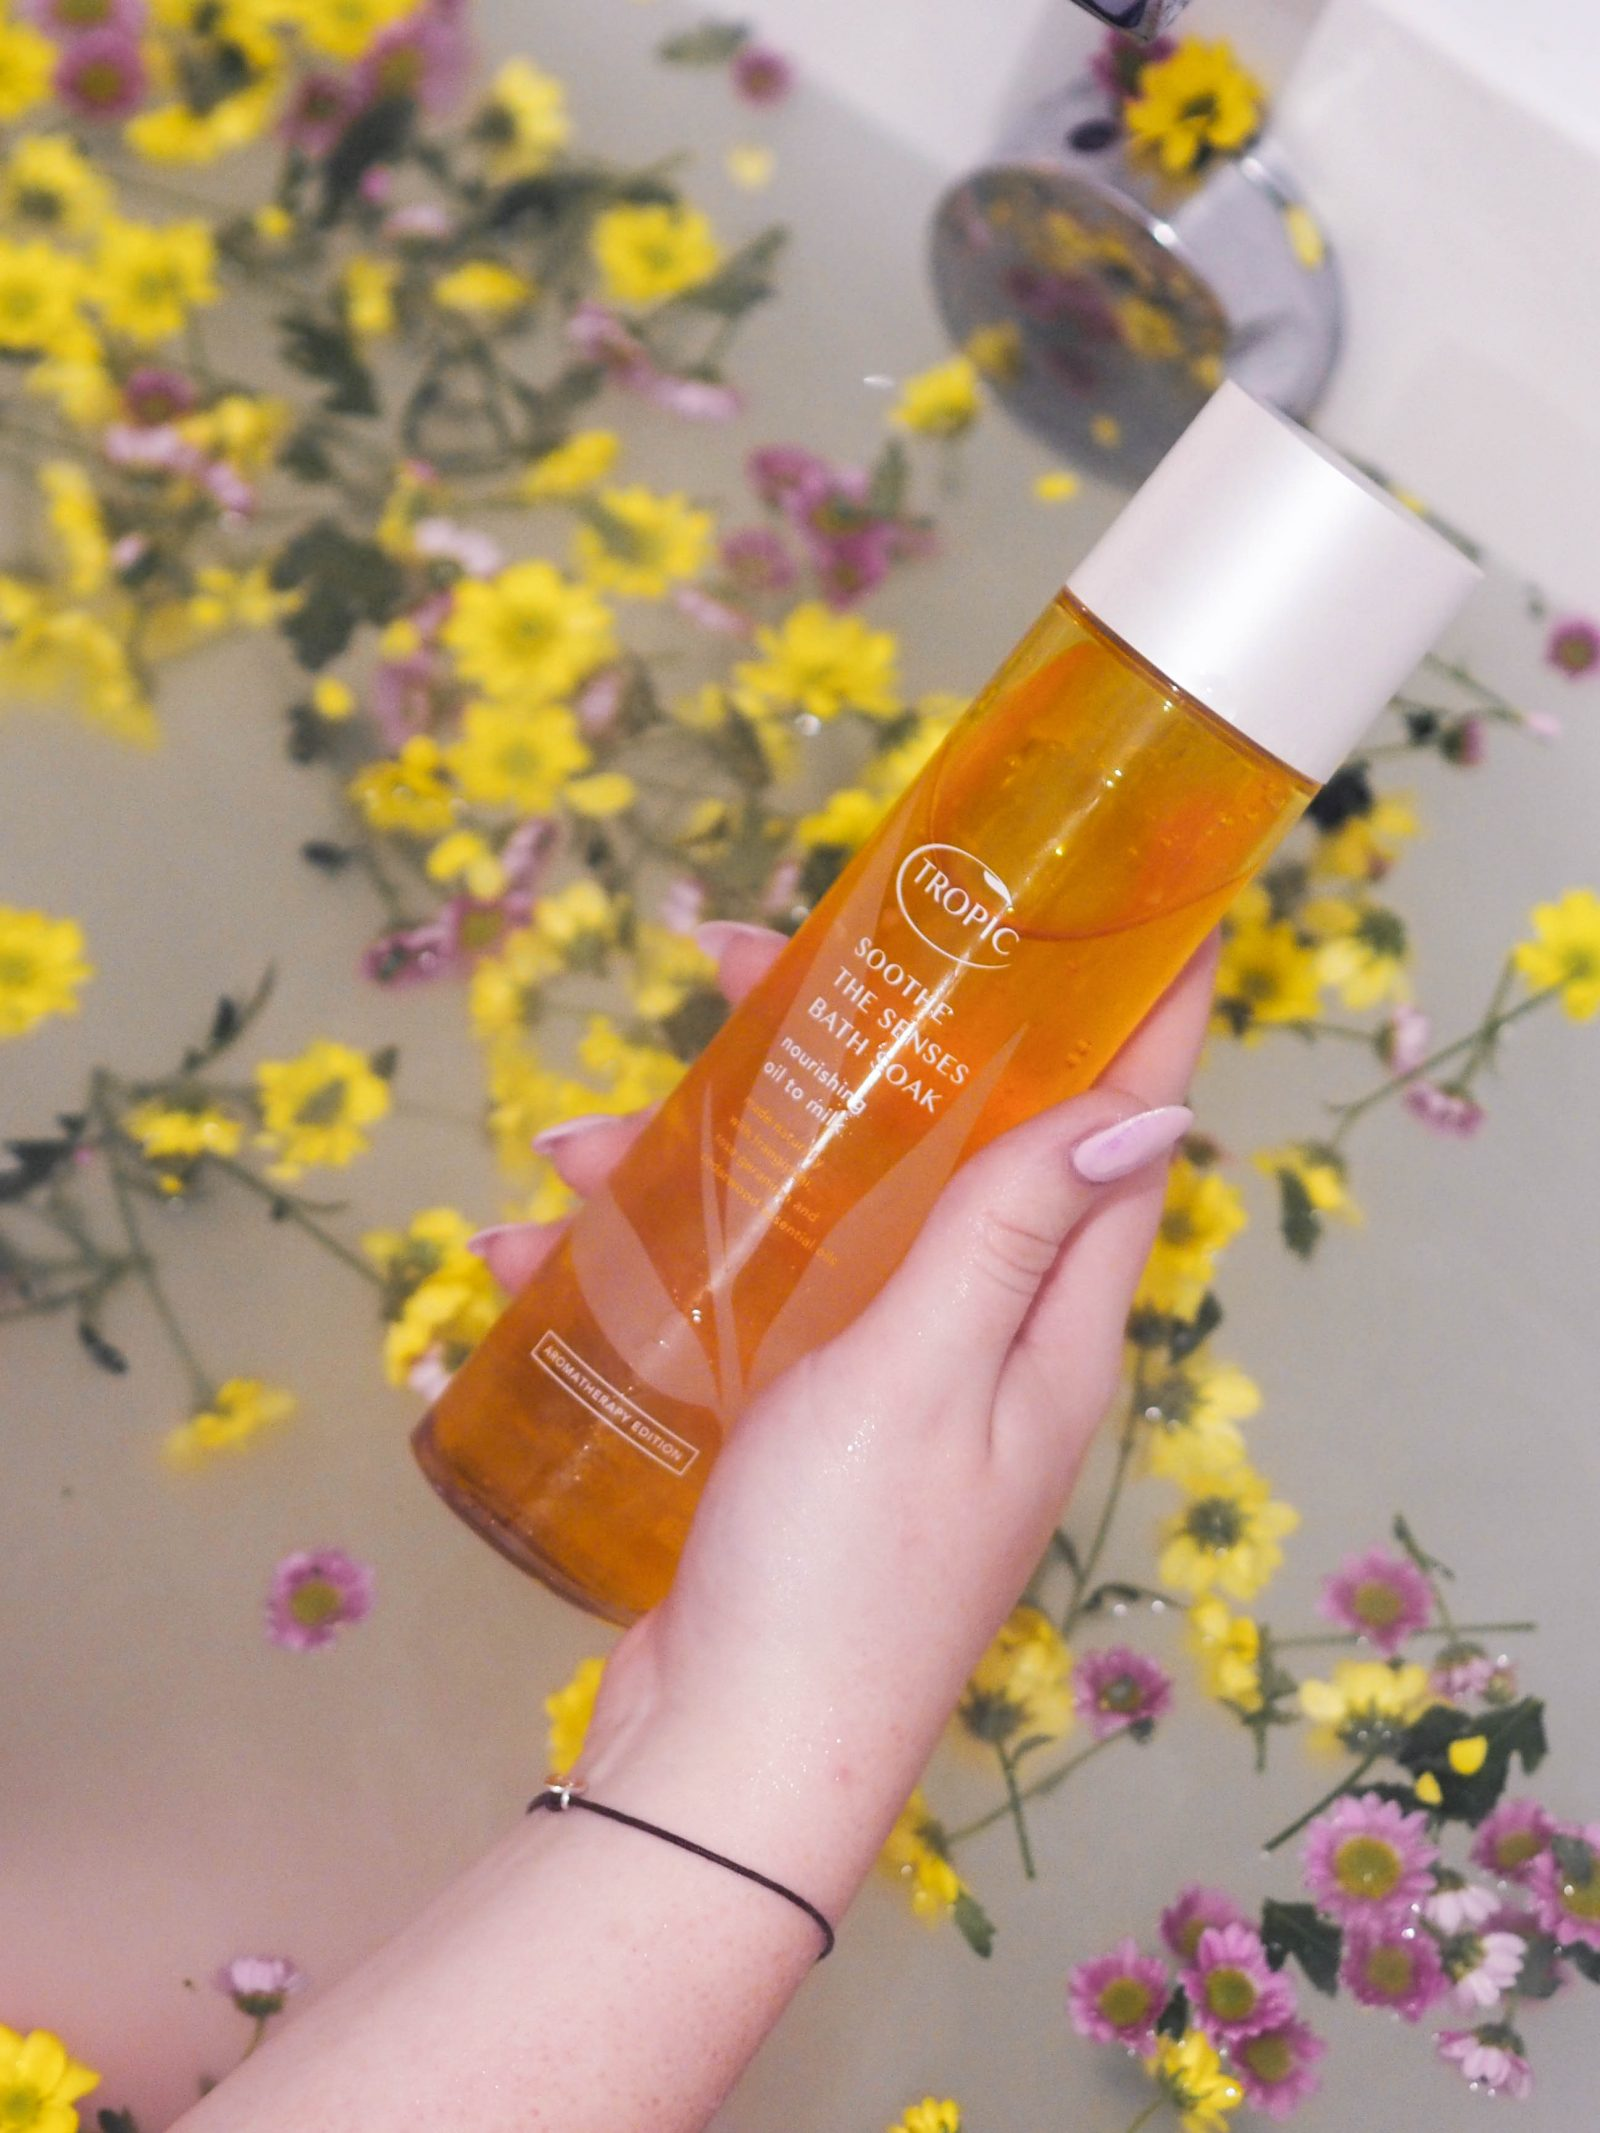 Upping my bath game with Tropic Skincare Bath Soaks | rhianna olivia